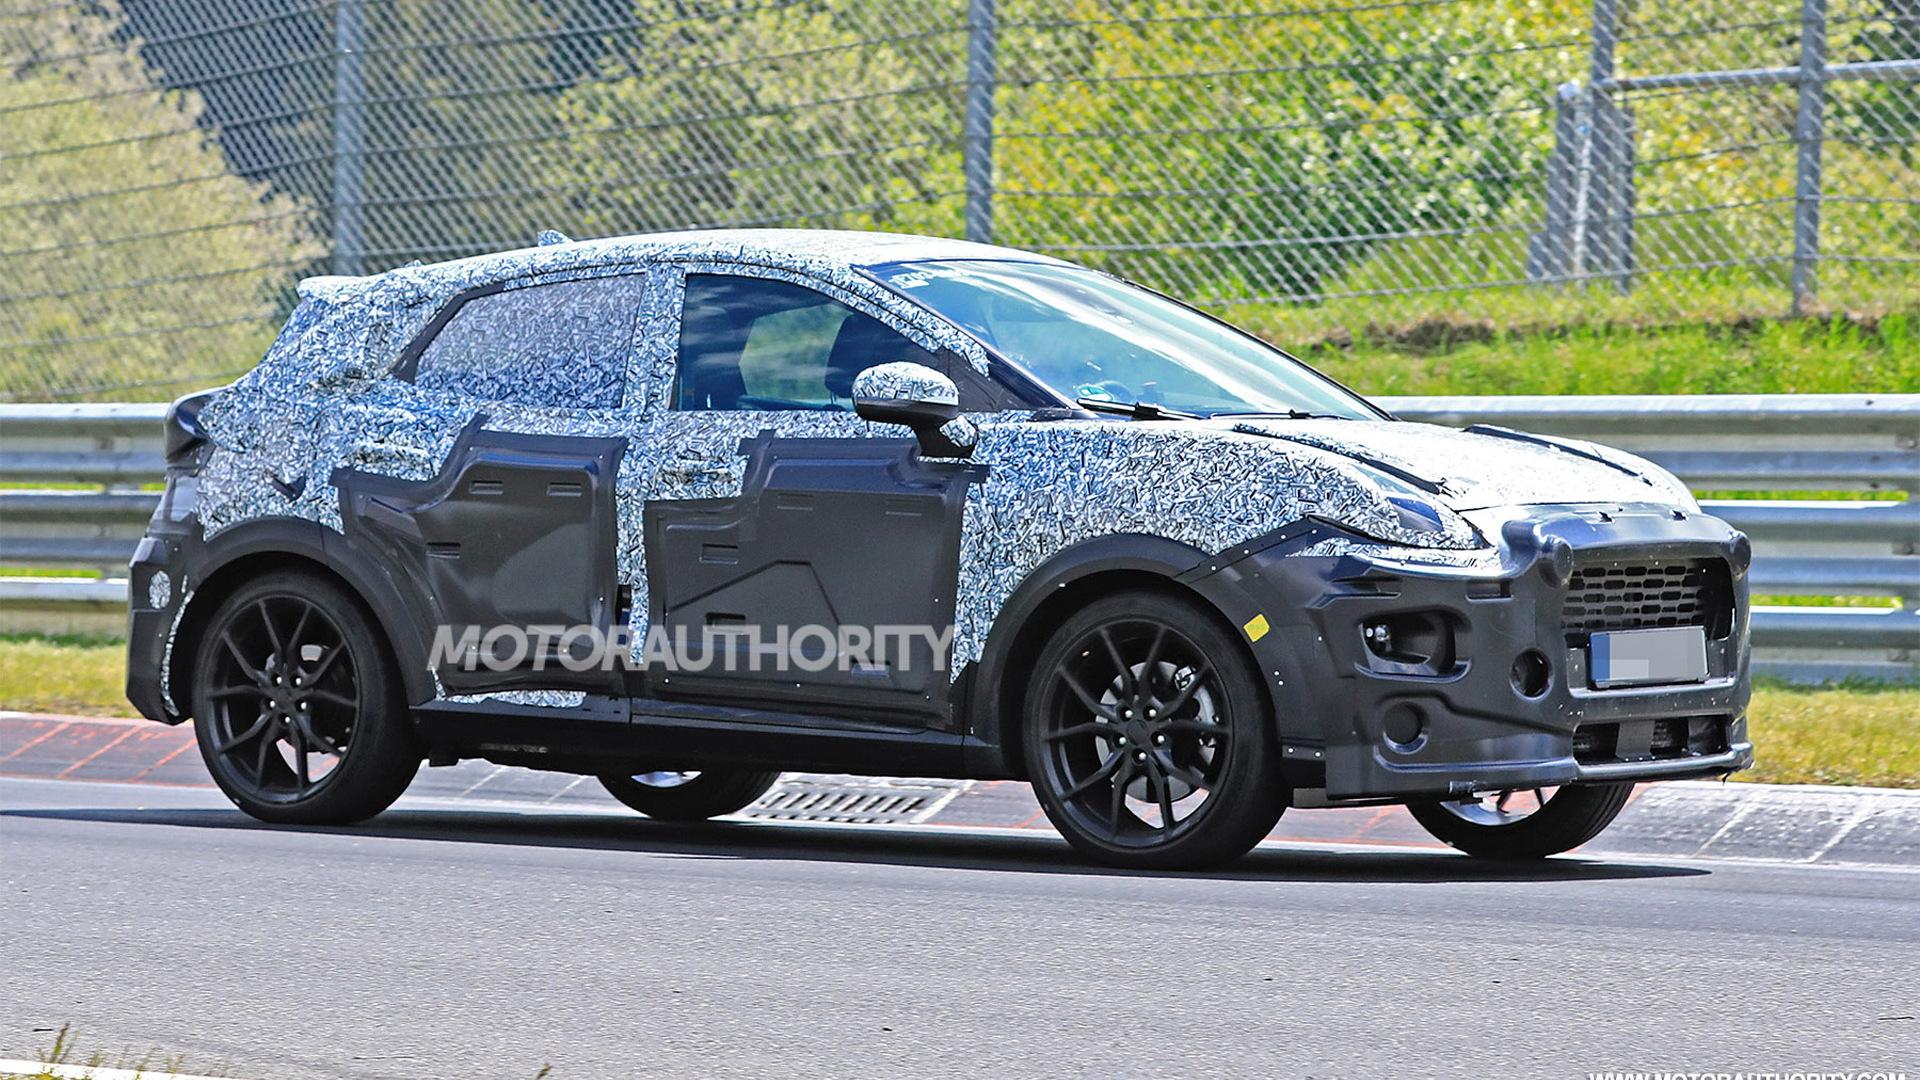 2021 Ford Puma Spy Photos, Release Date >> 2021 Ford Puma St Spy Shots